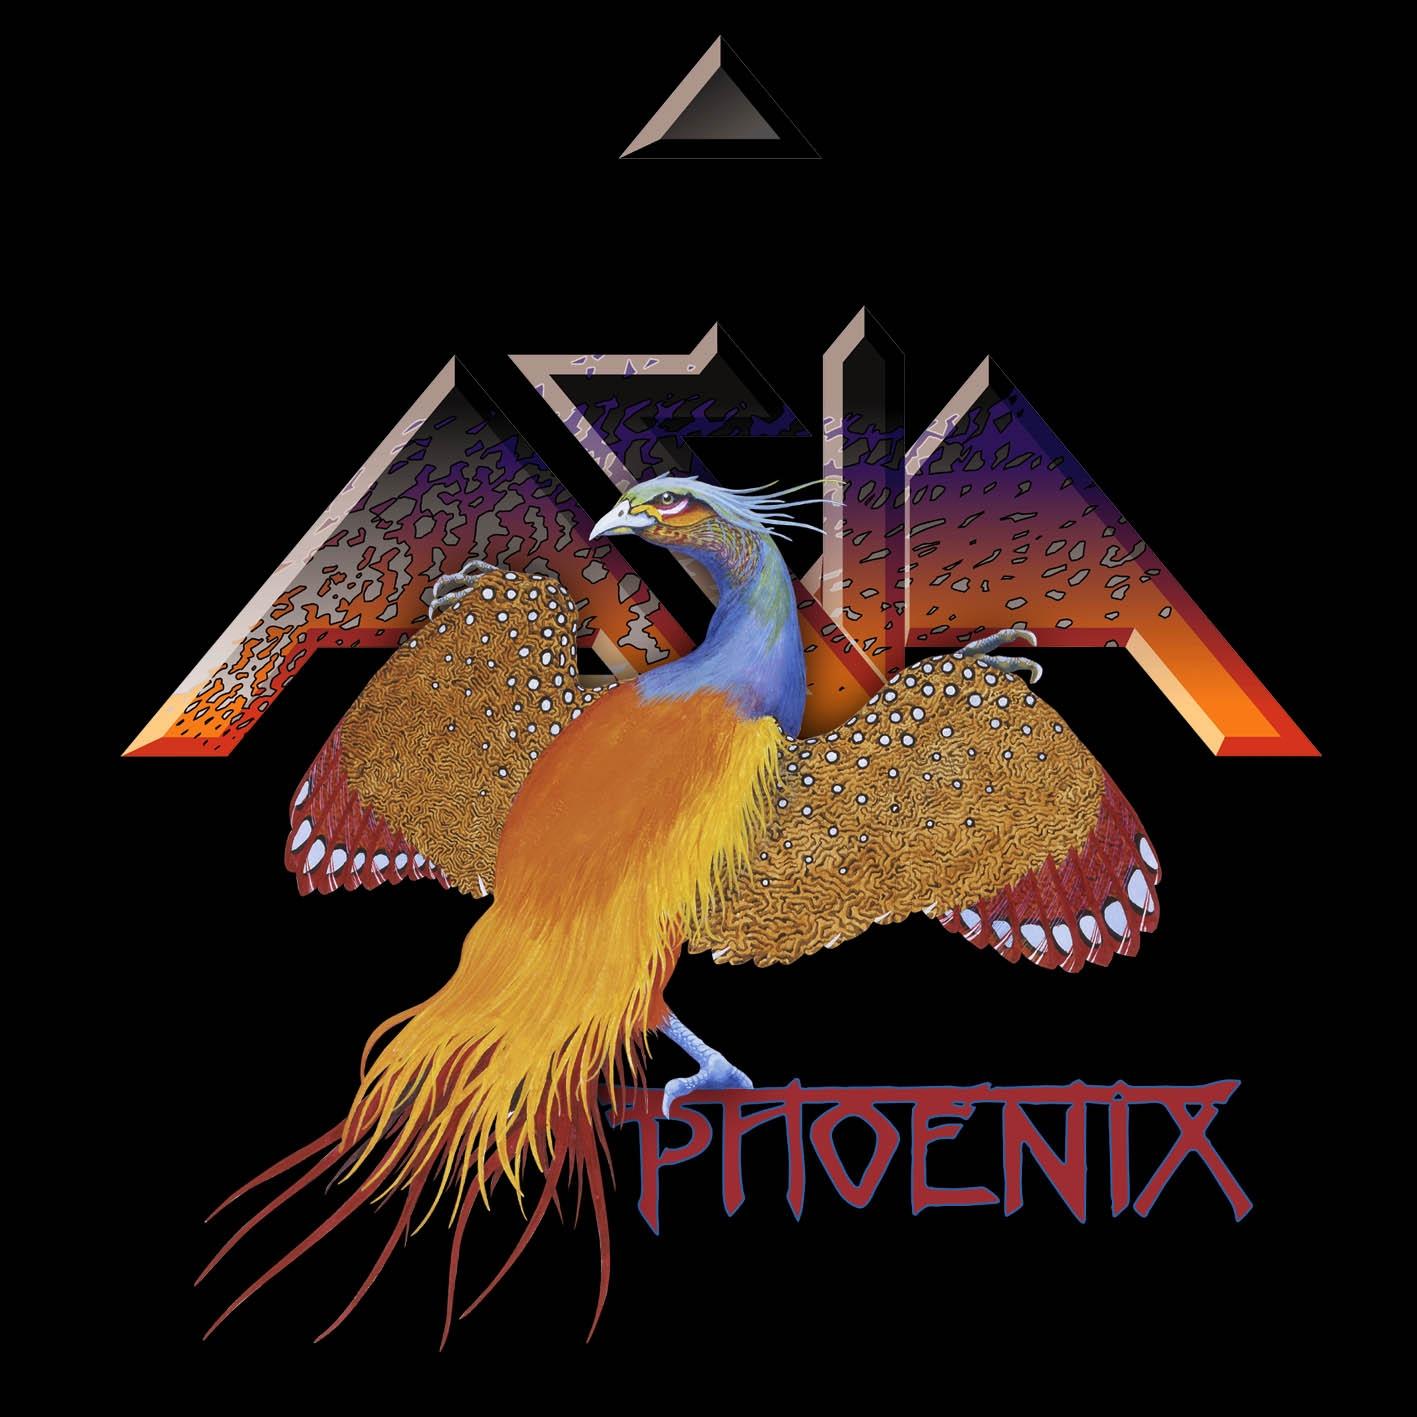 Phoenix_Reissue_2016 2CD Special